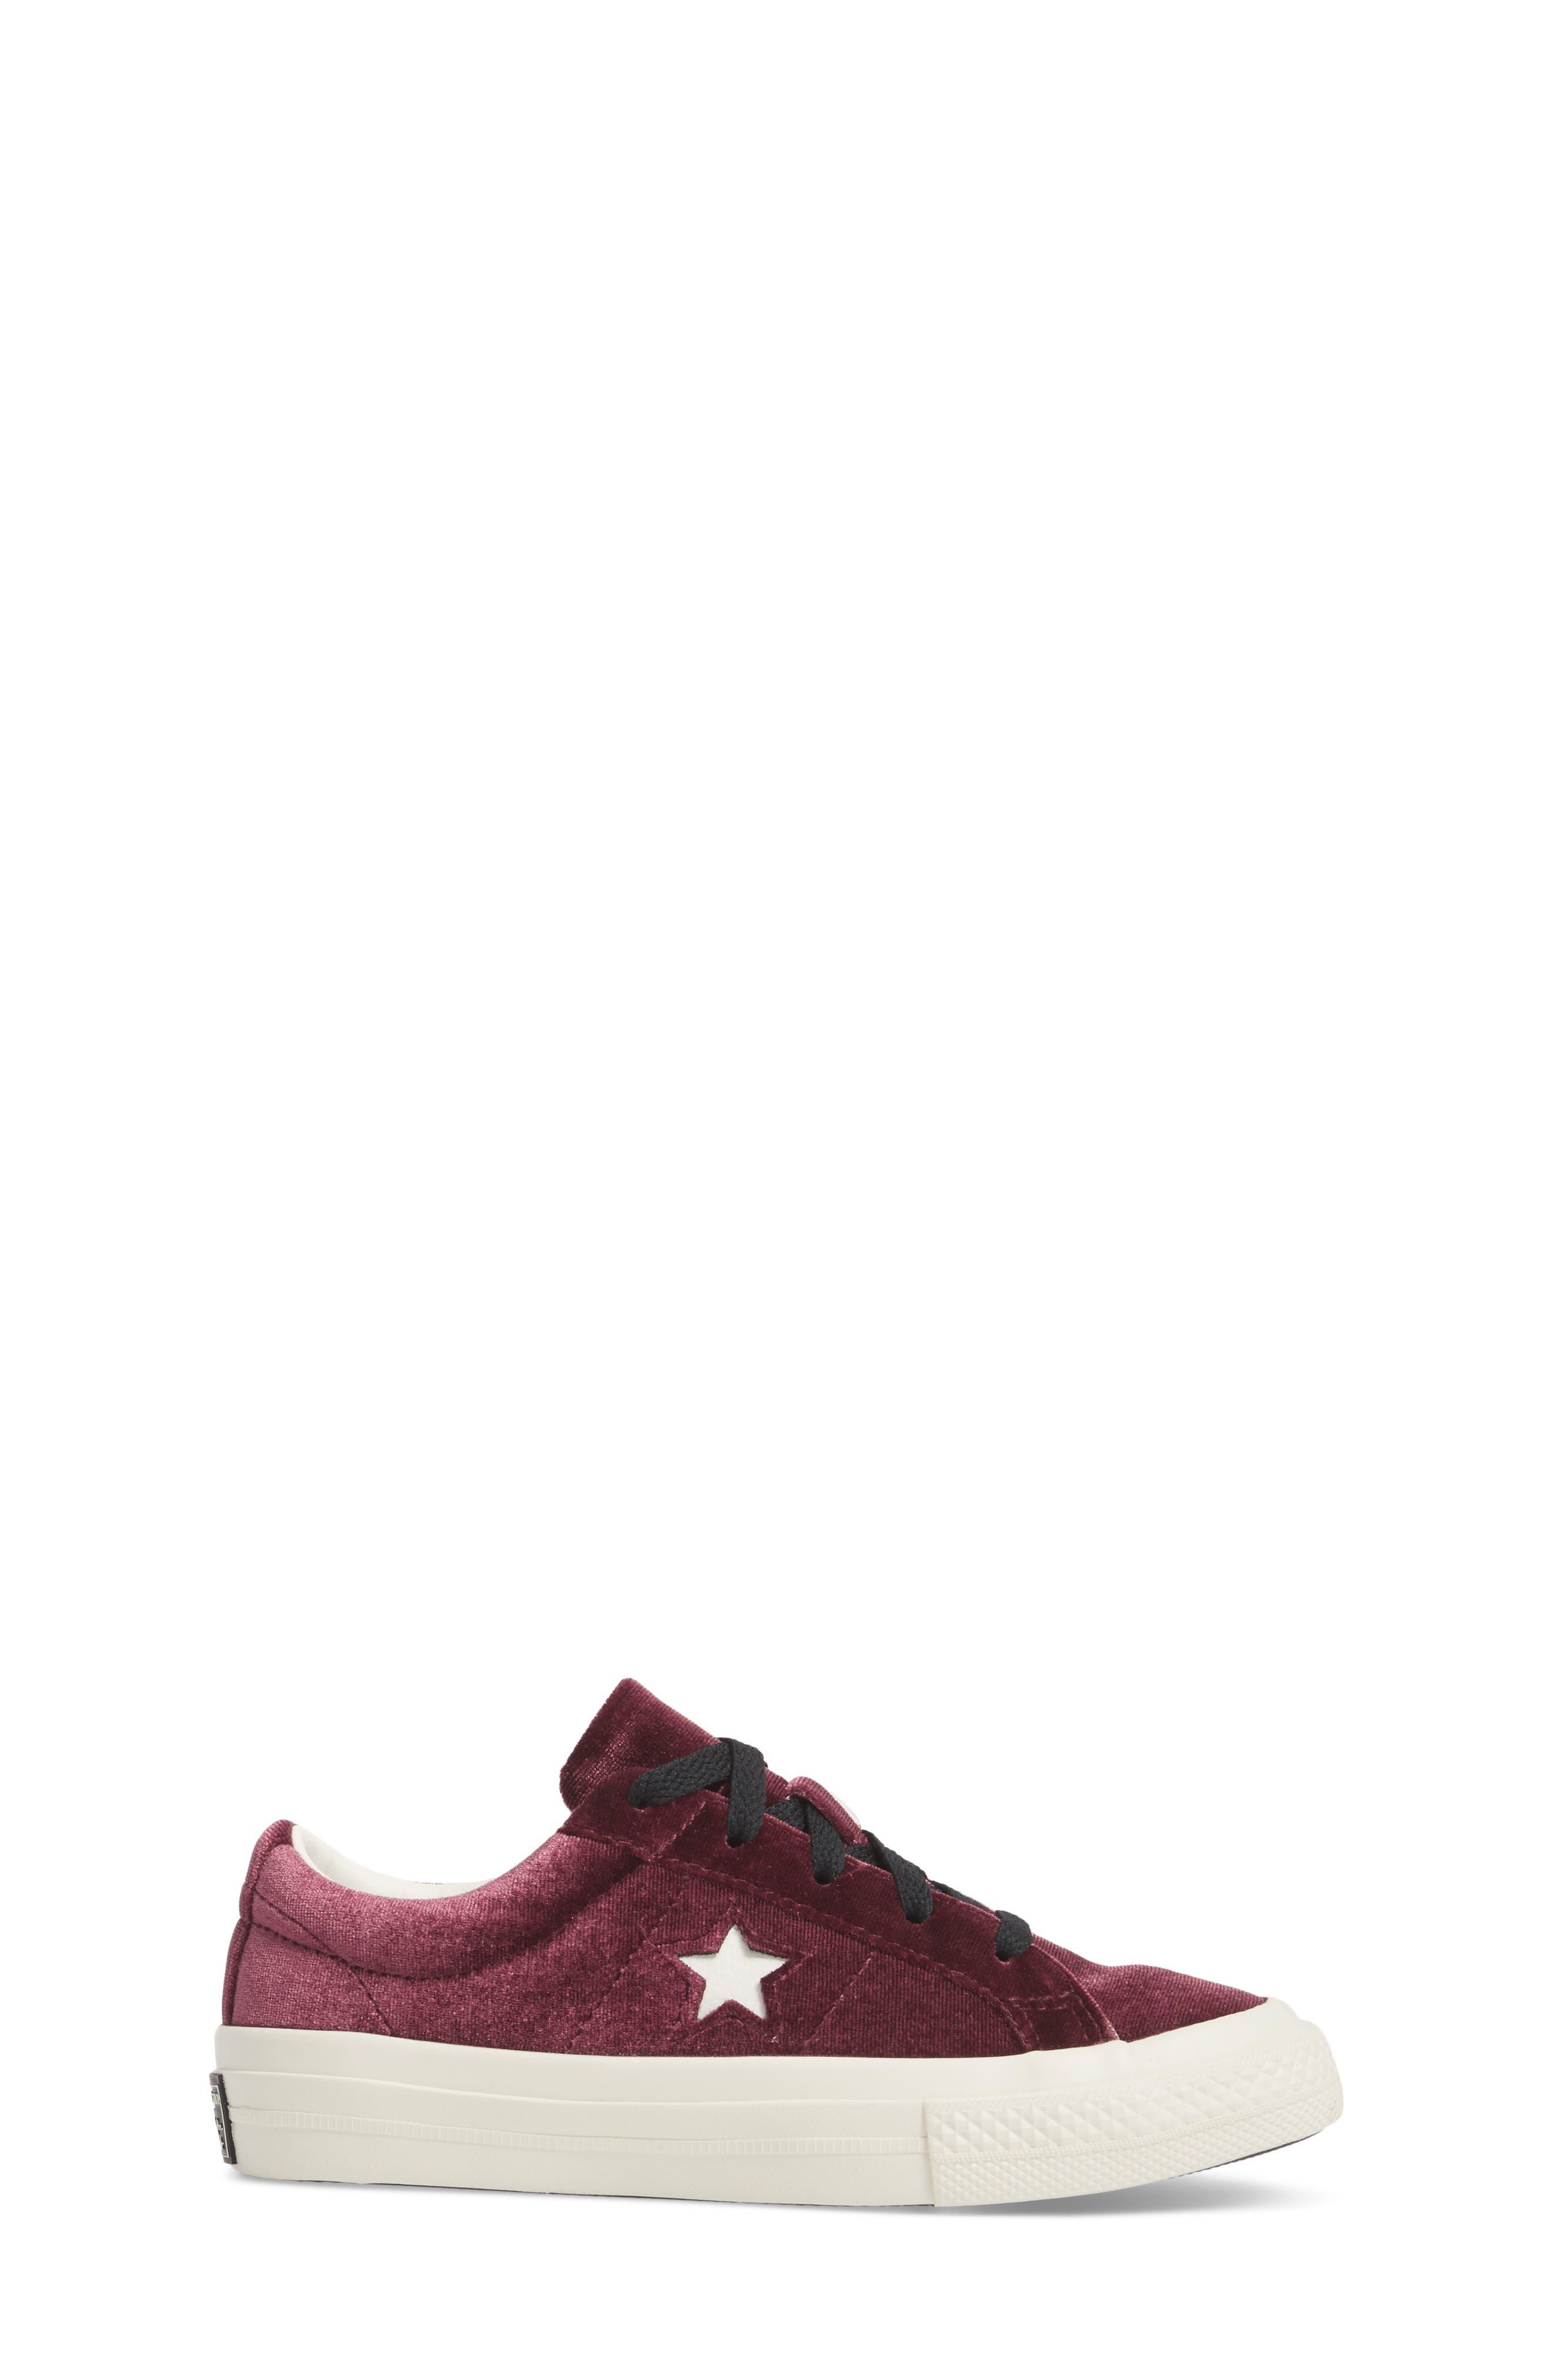 Alternate Image 3  - Converse Chuck Taylor® All Star® One Star Velvet Platform Sneaker (Toddler, Little Kid & Big Kid)